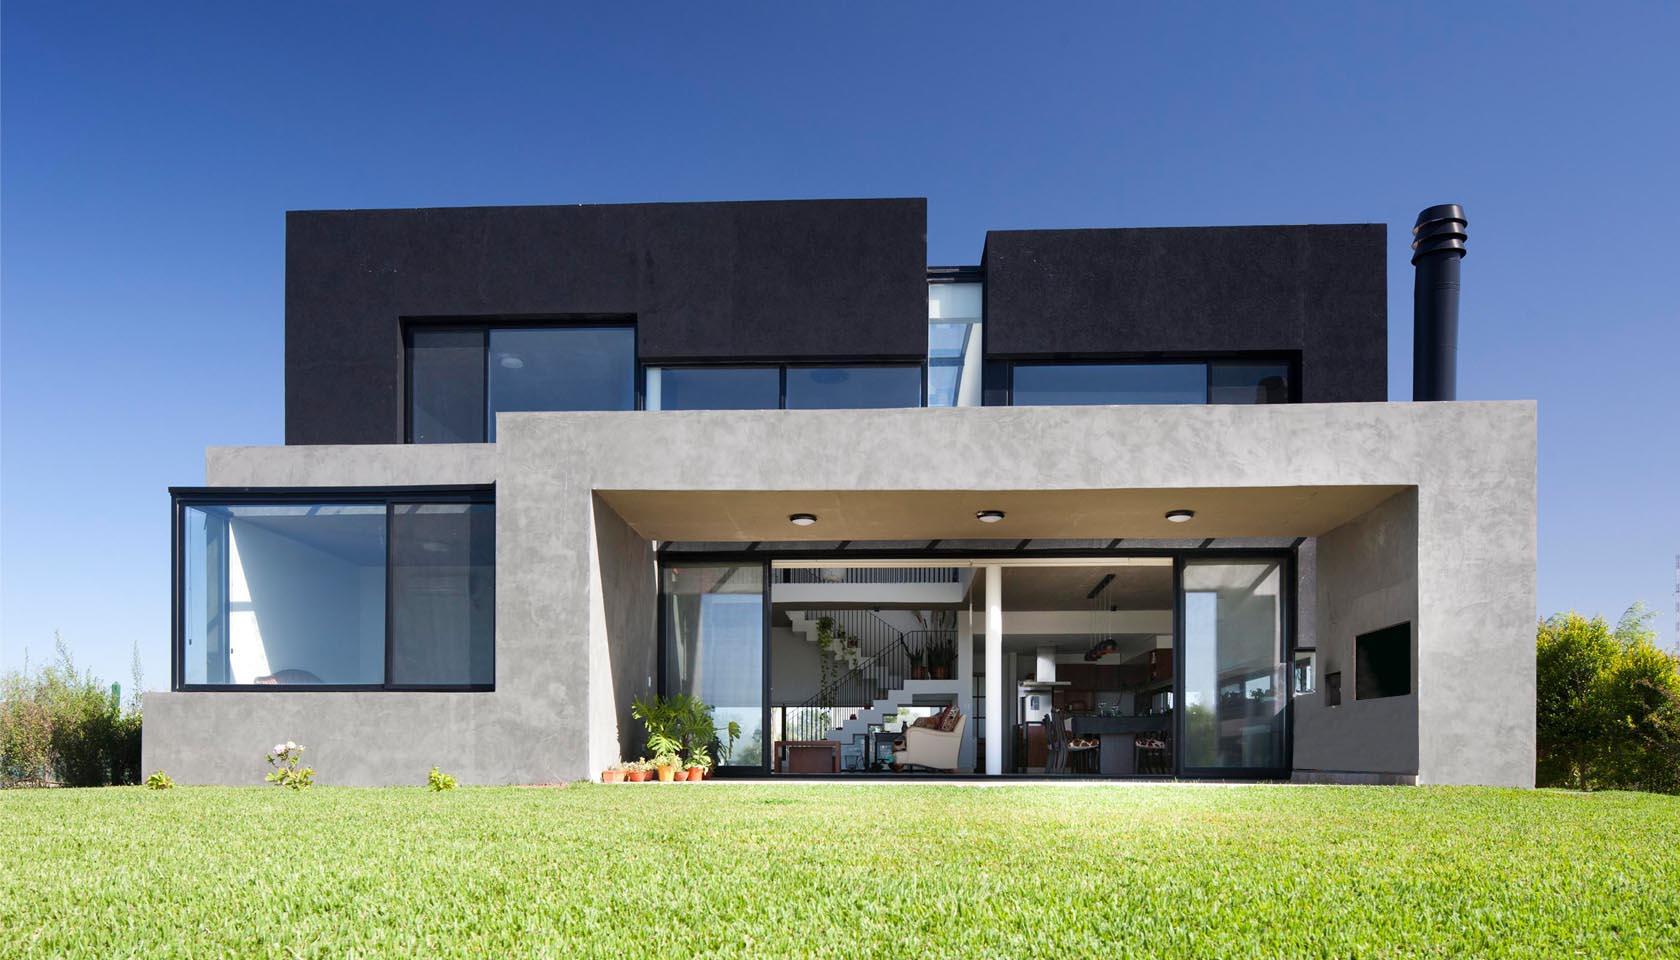 galerías modernas, arquitectura volumétrica